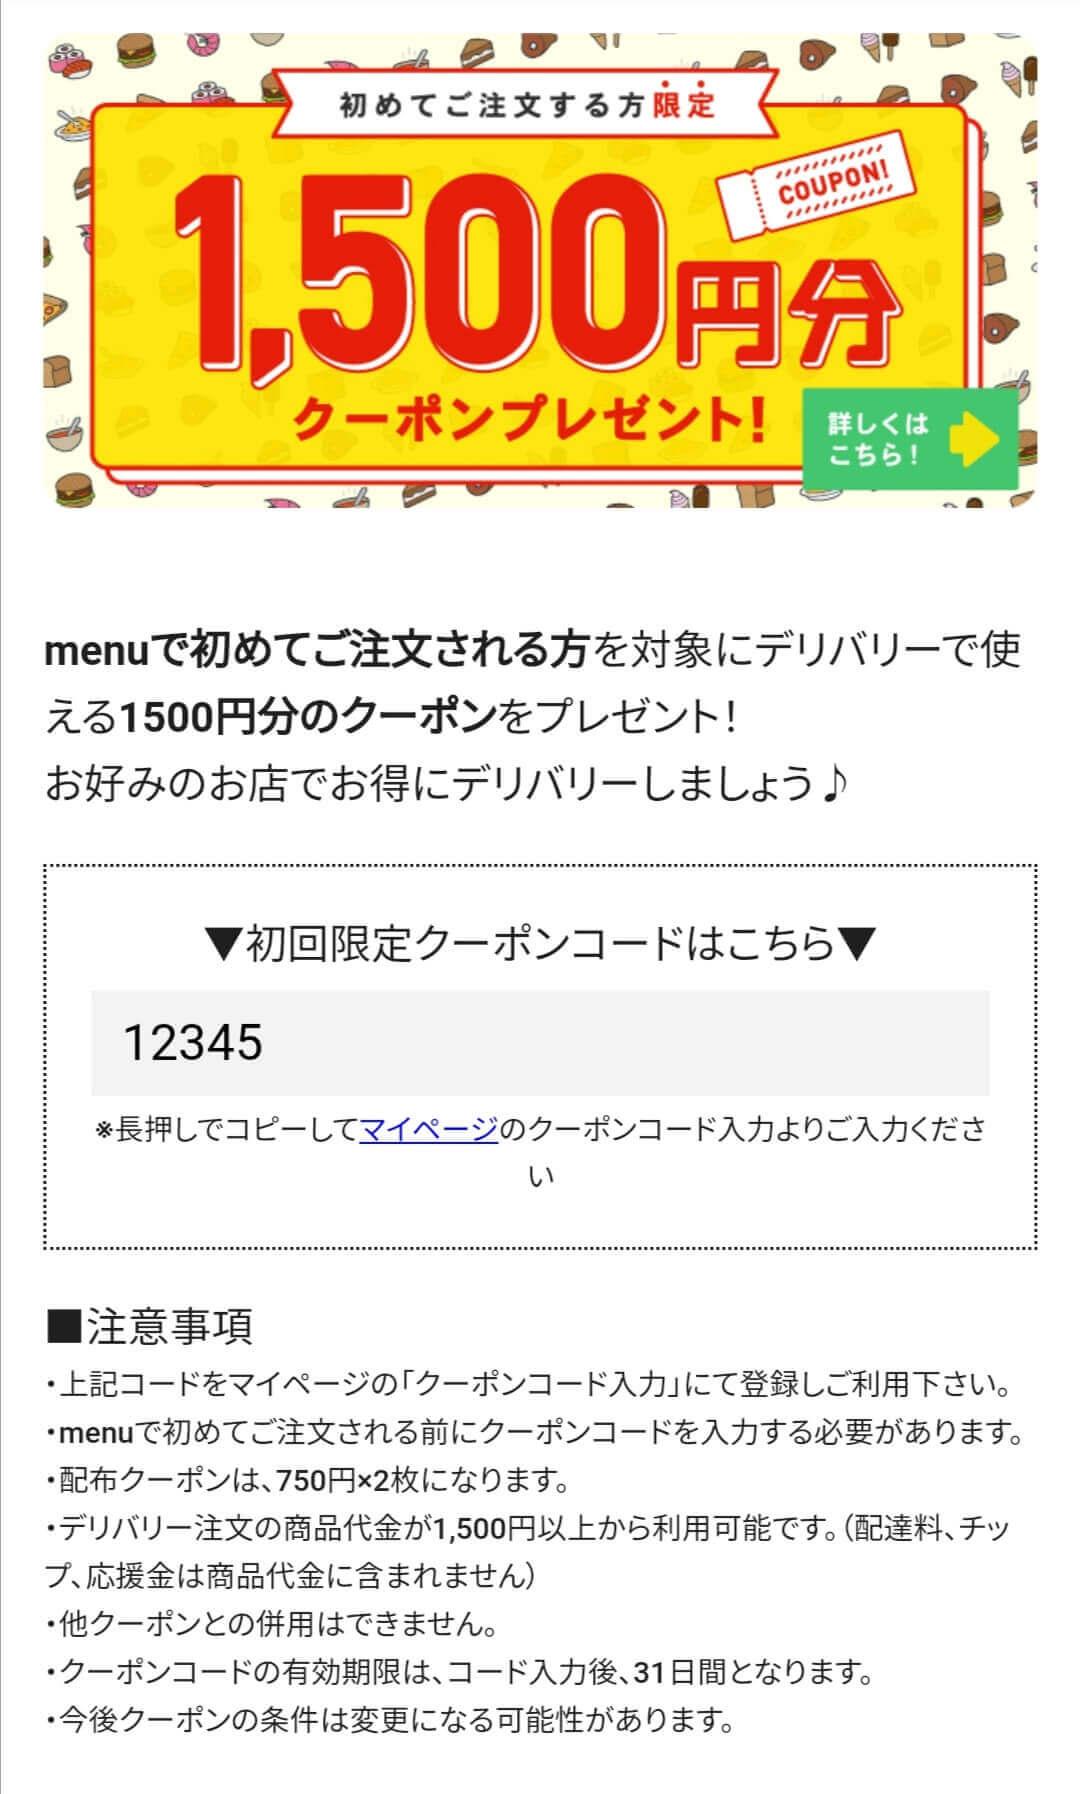 menu初回クーポンコード1500円